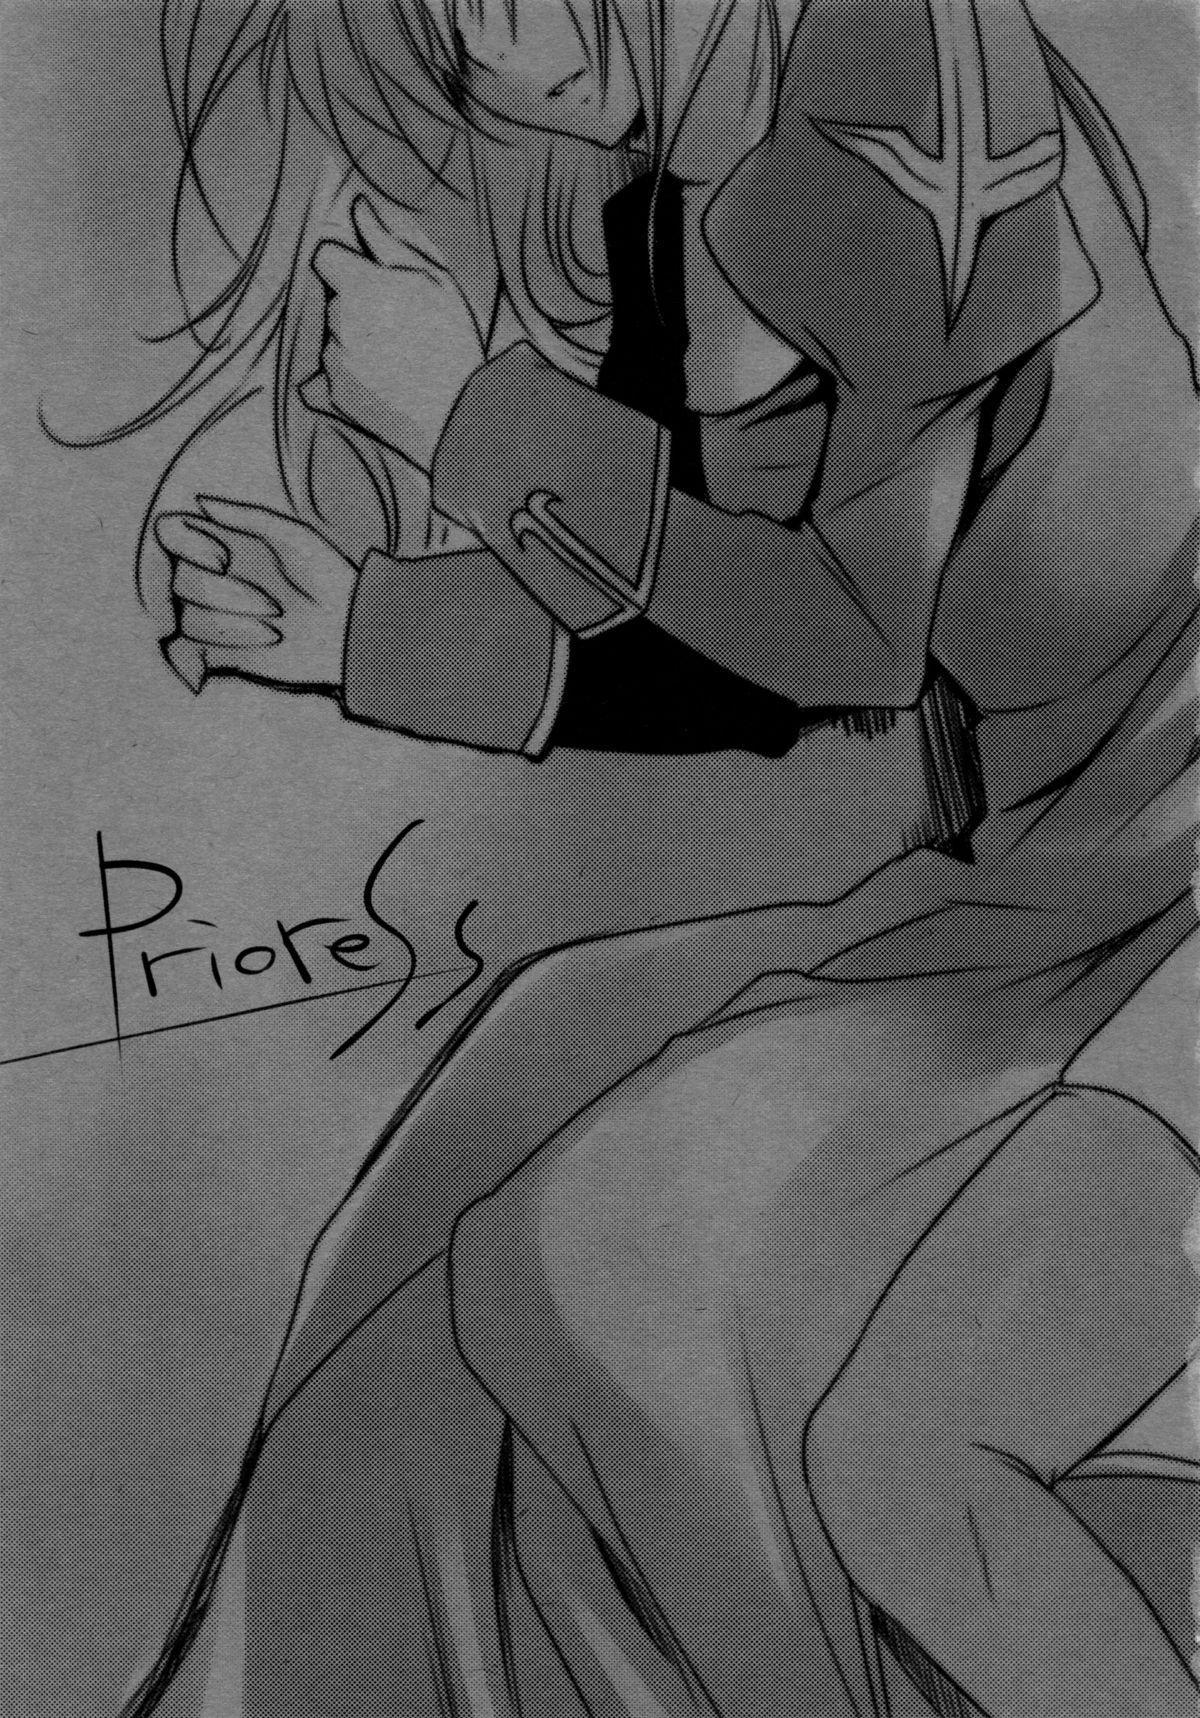 Prioress 1